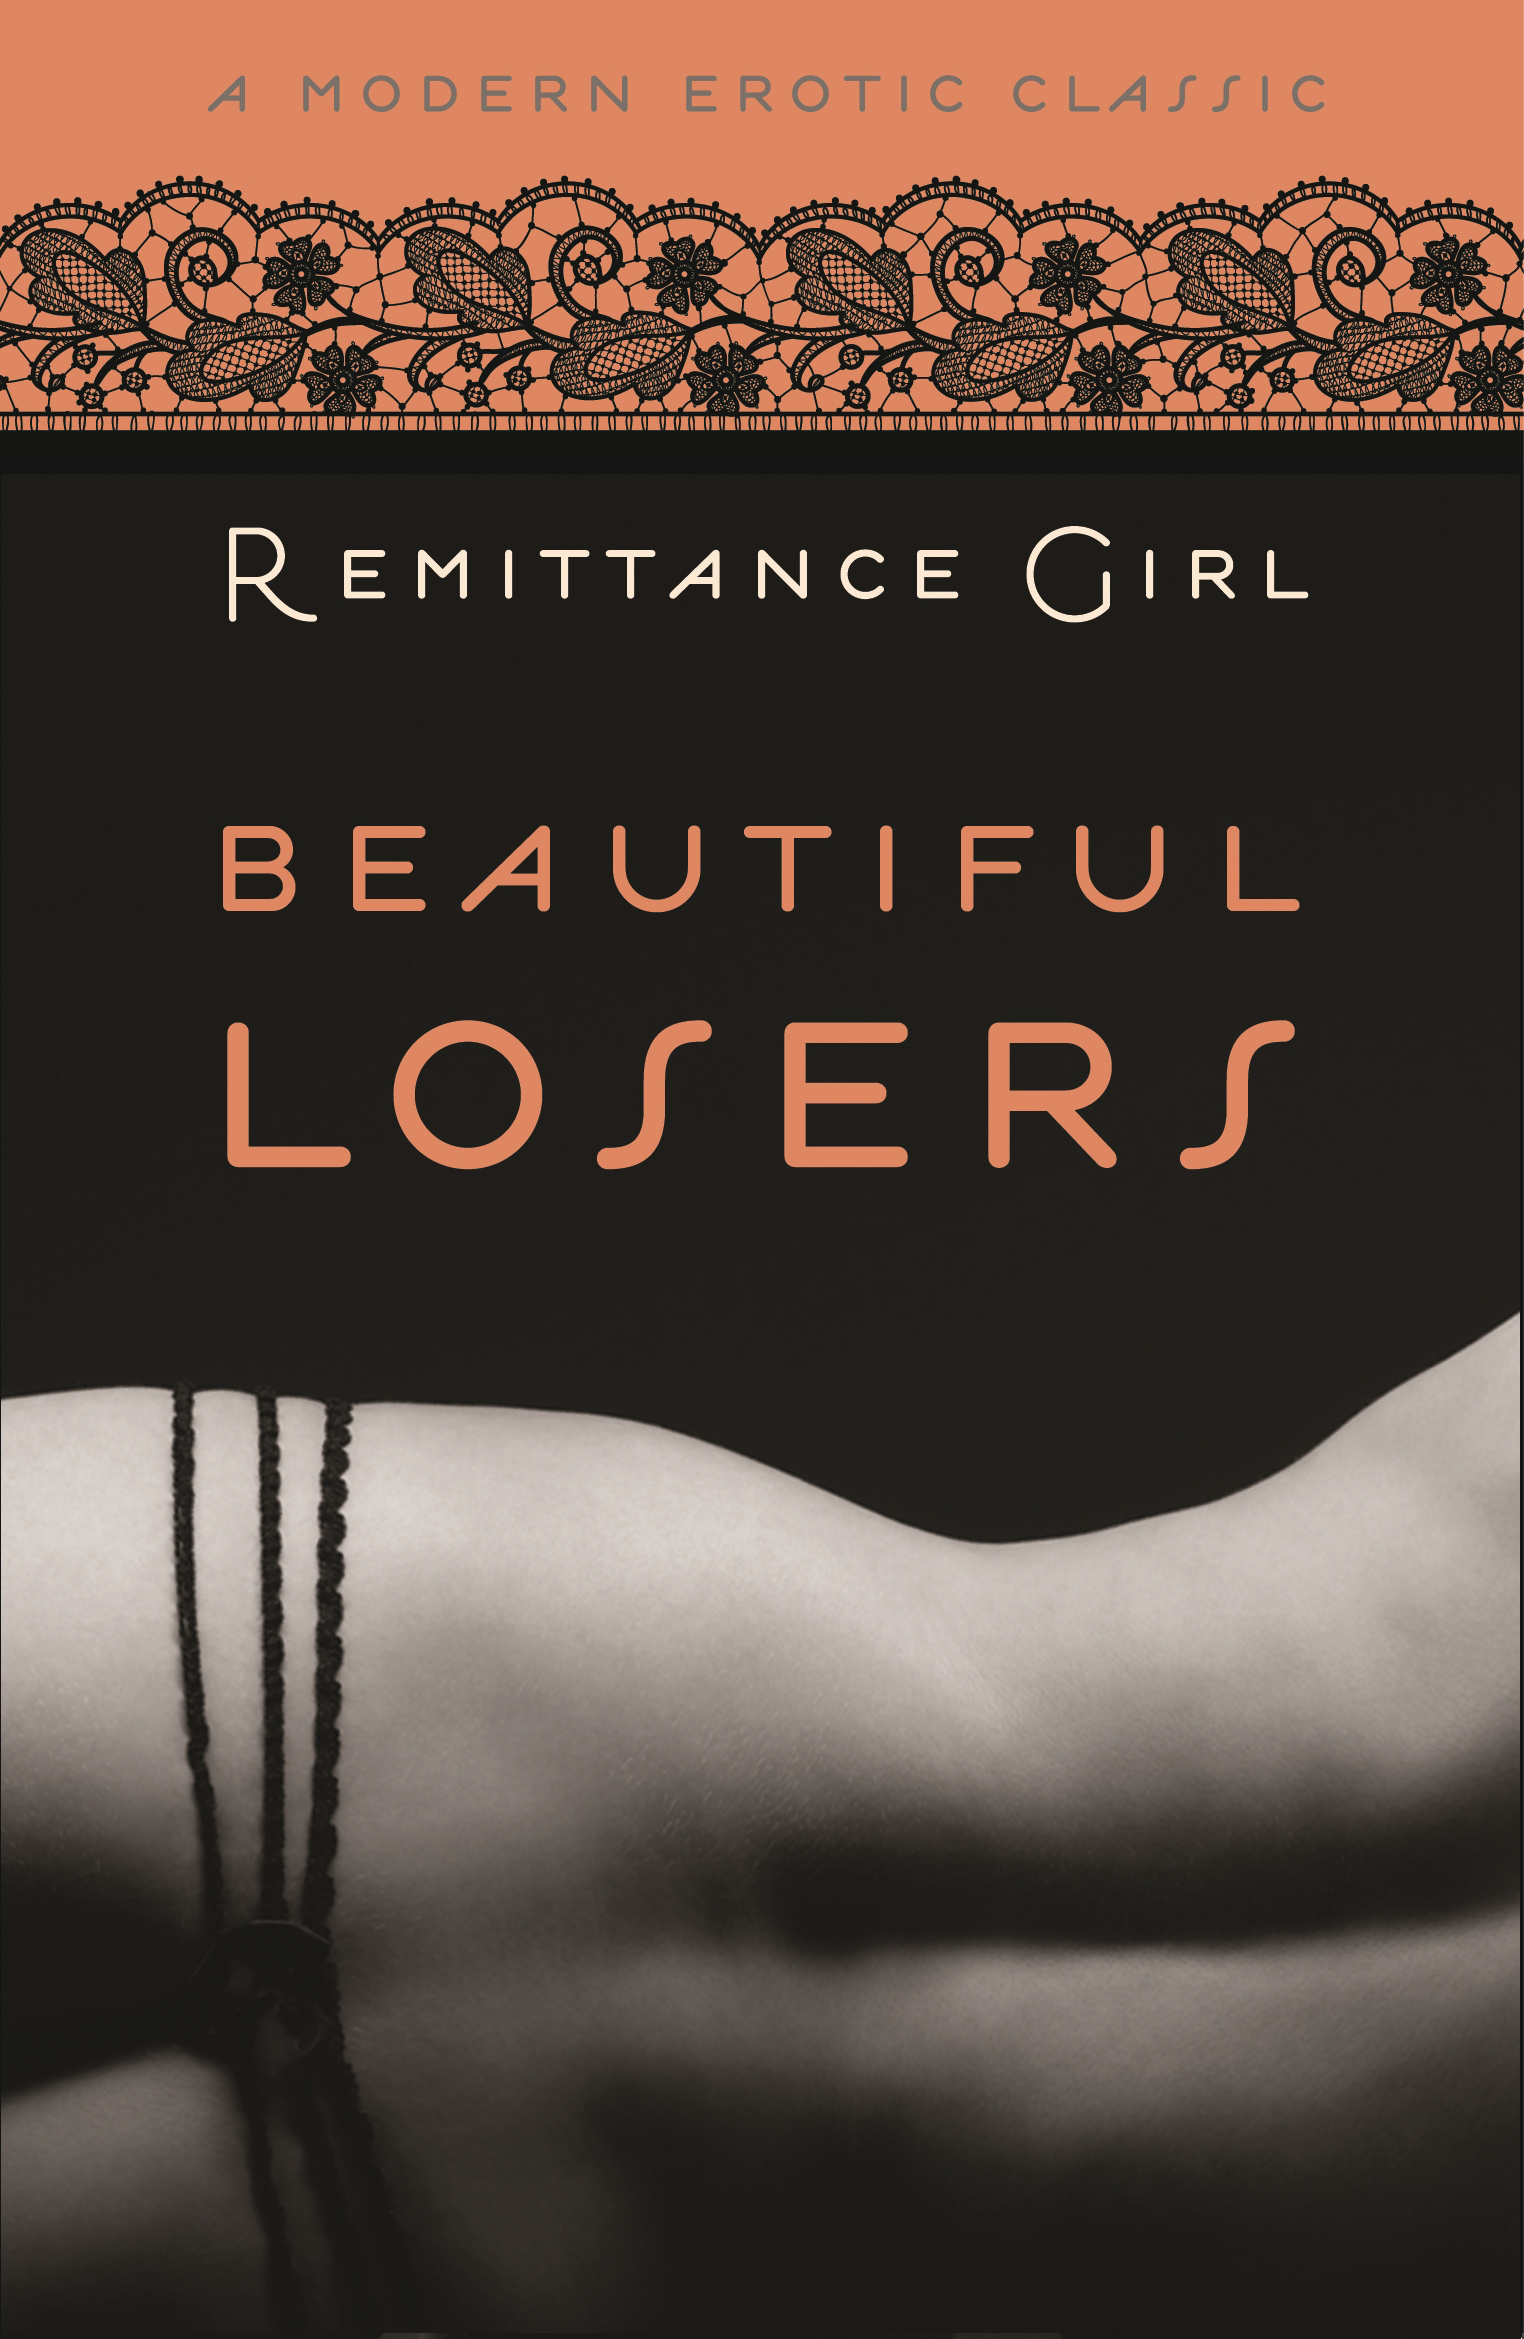 Remittance girl erotica